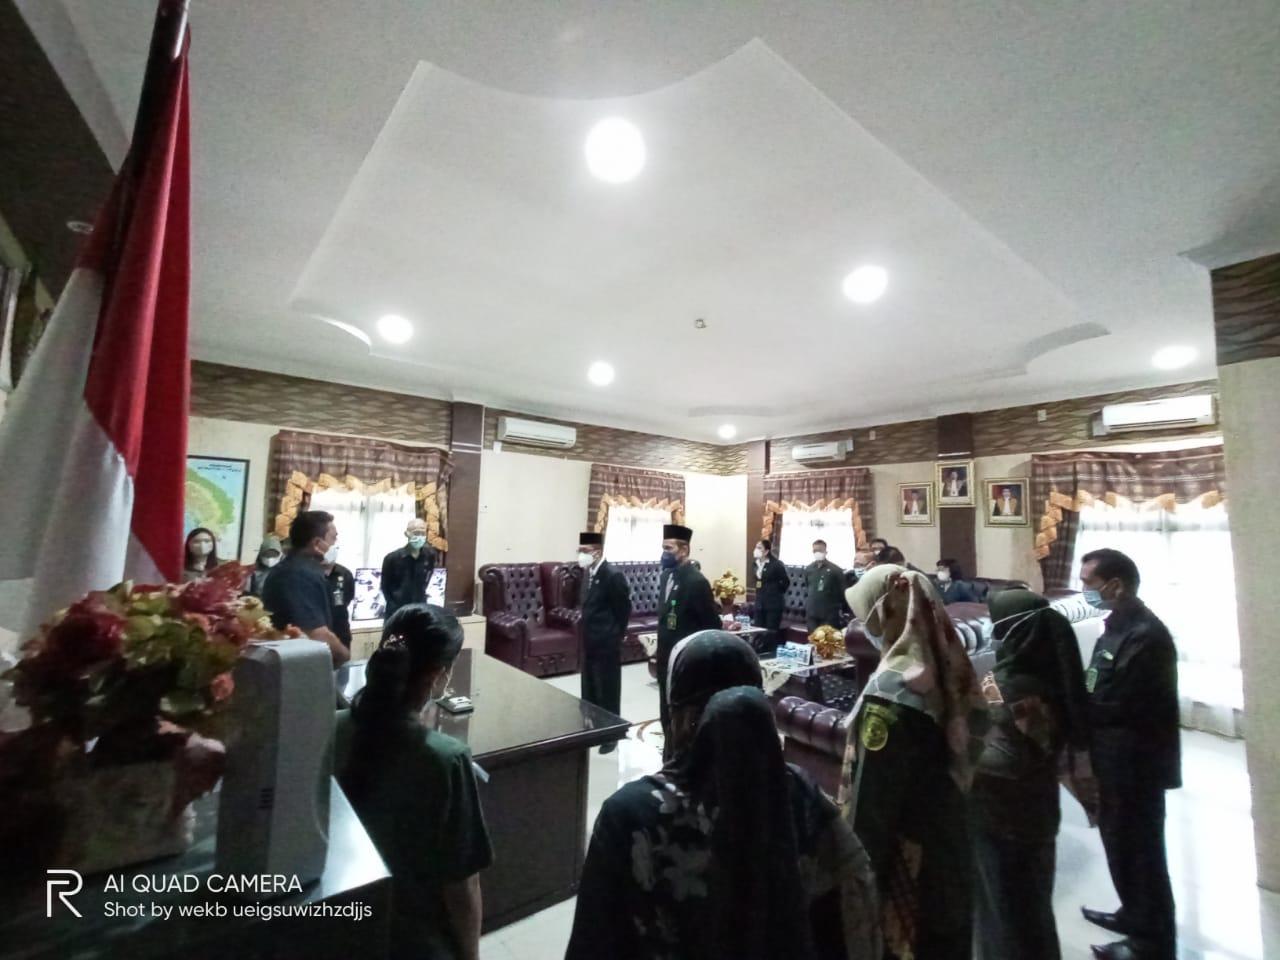 Serah terima tugas dan tanggung jawab Ketua Pengadilan Negeri Lubuk Pakam Kelas I A dari Bapak Jhon Sarman Saragih S.H. M. Hum. kepada Bapak Wakil Ketua R. Heru Kuntodewo, S.H., M.H.